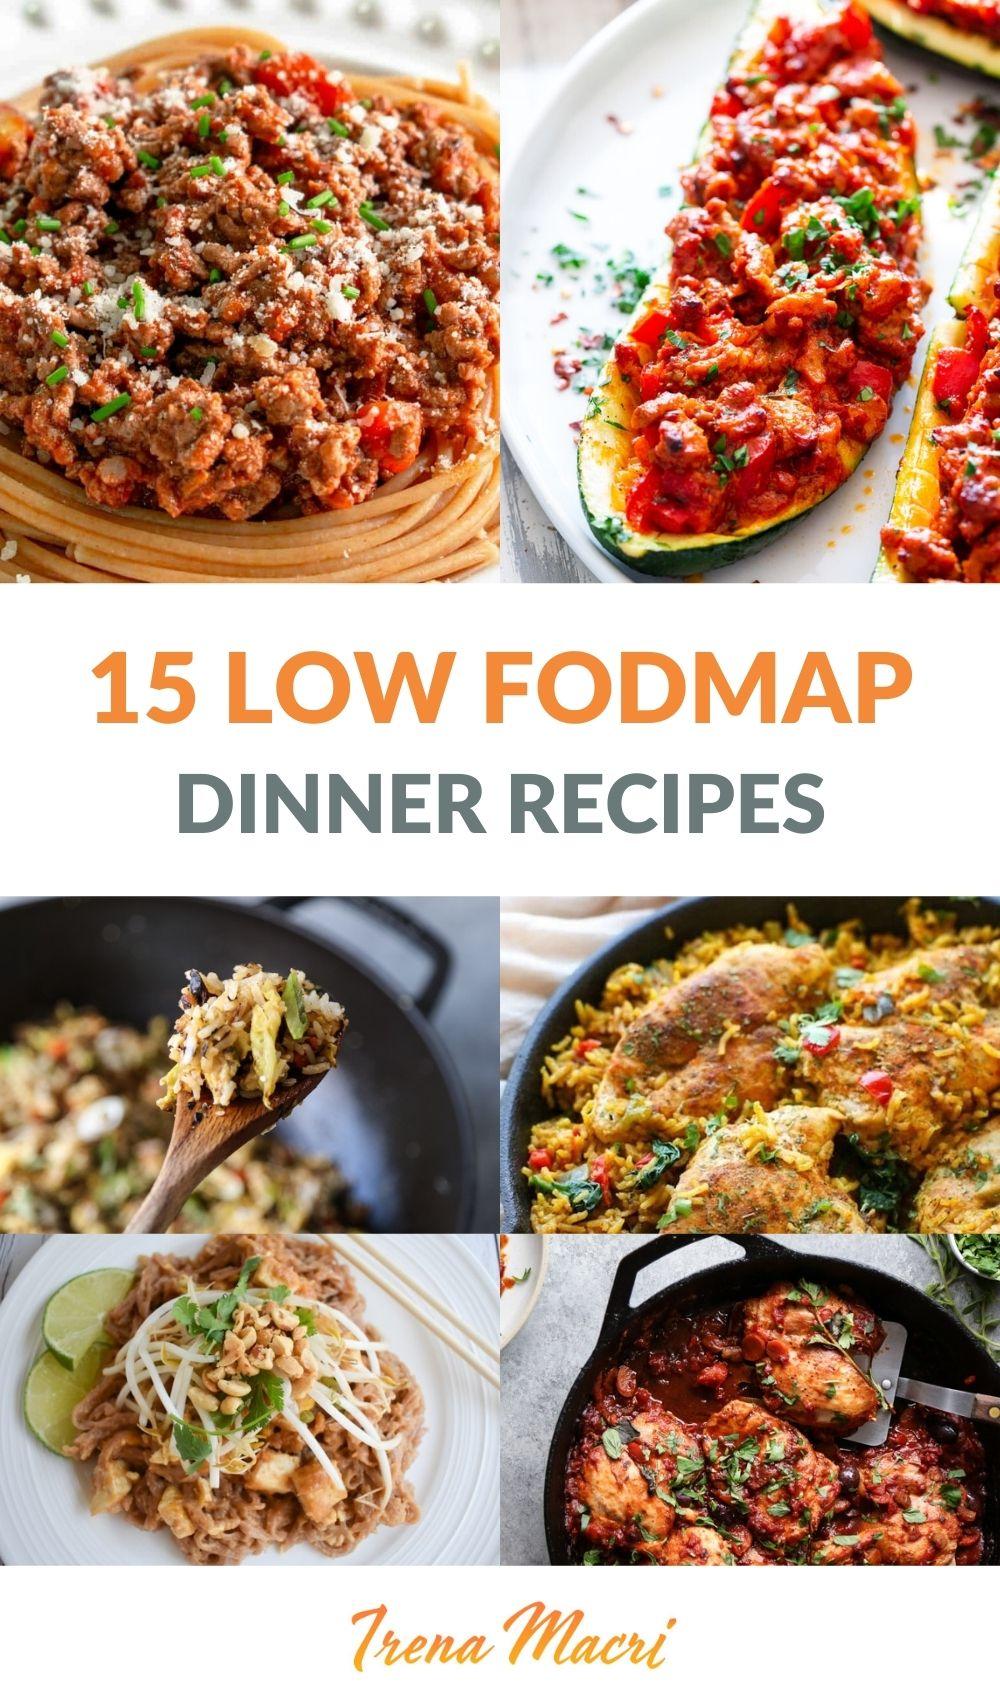 Low Fodmap Dinner Recipes